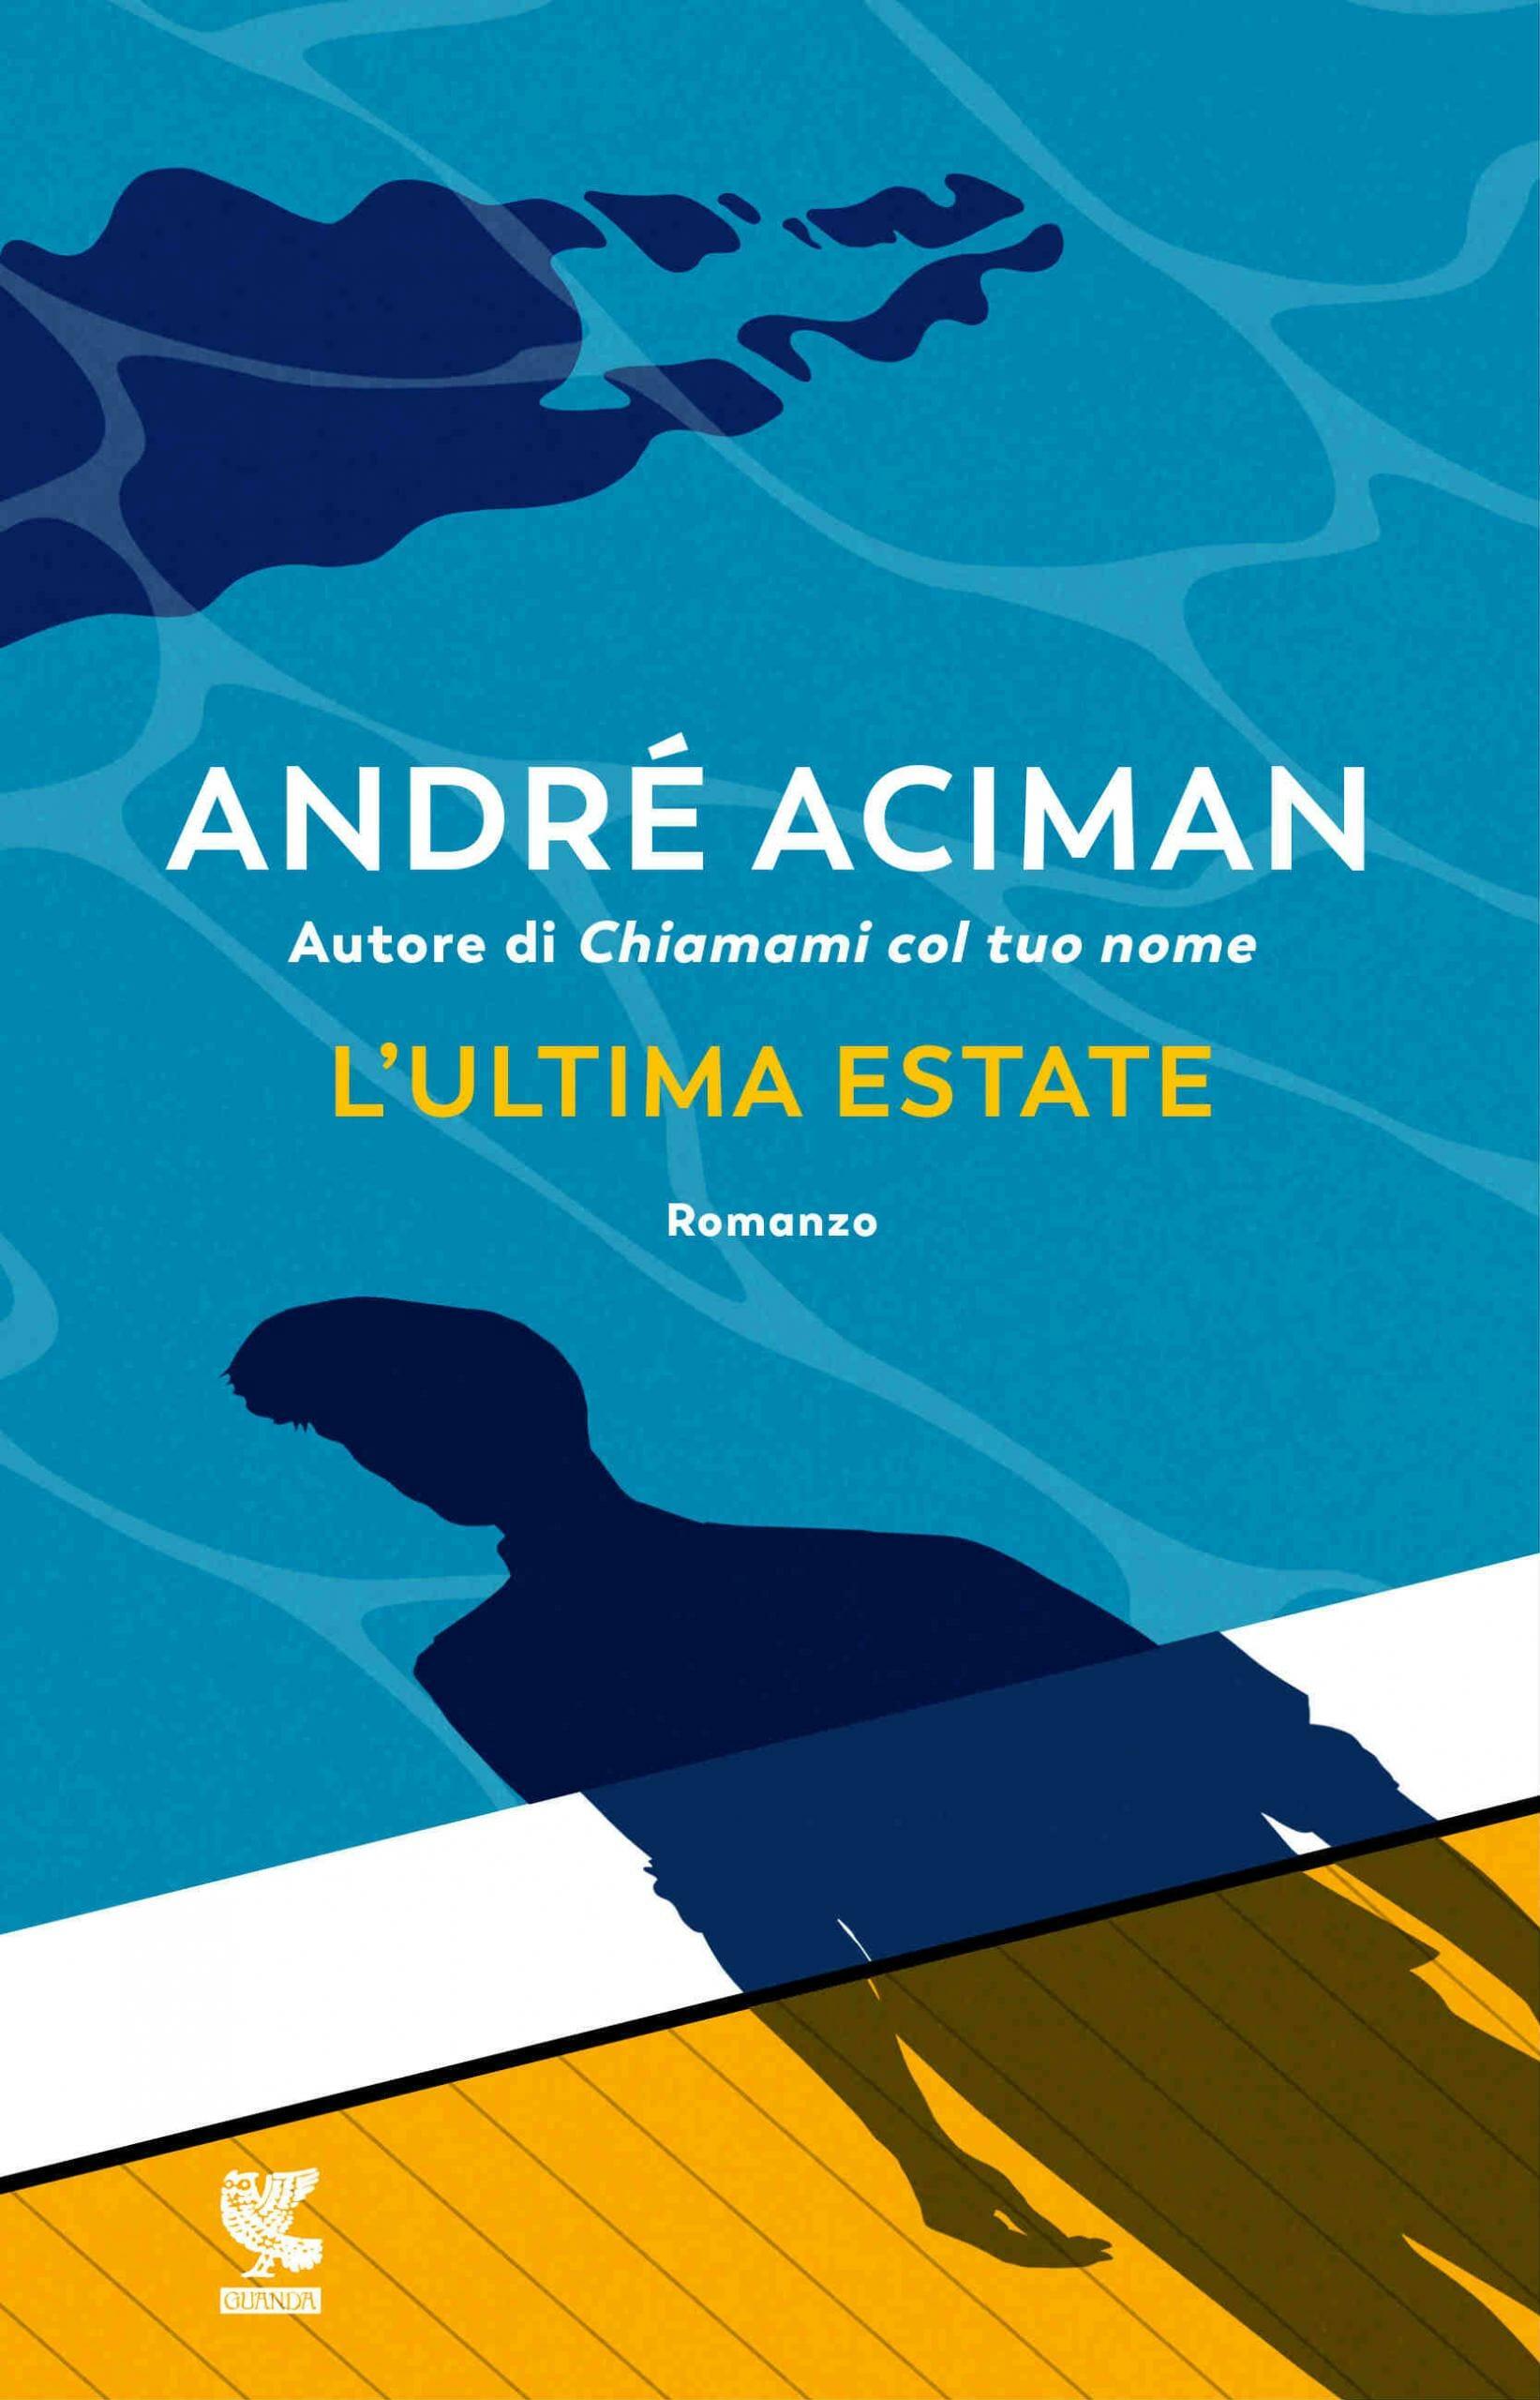 Aciman_L'ultima estate libri da leggere 2021